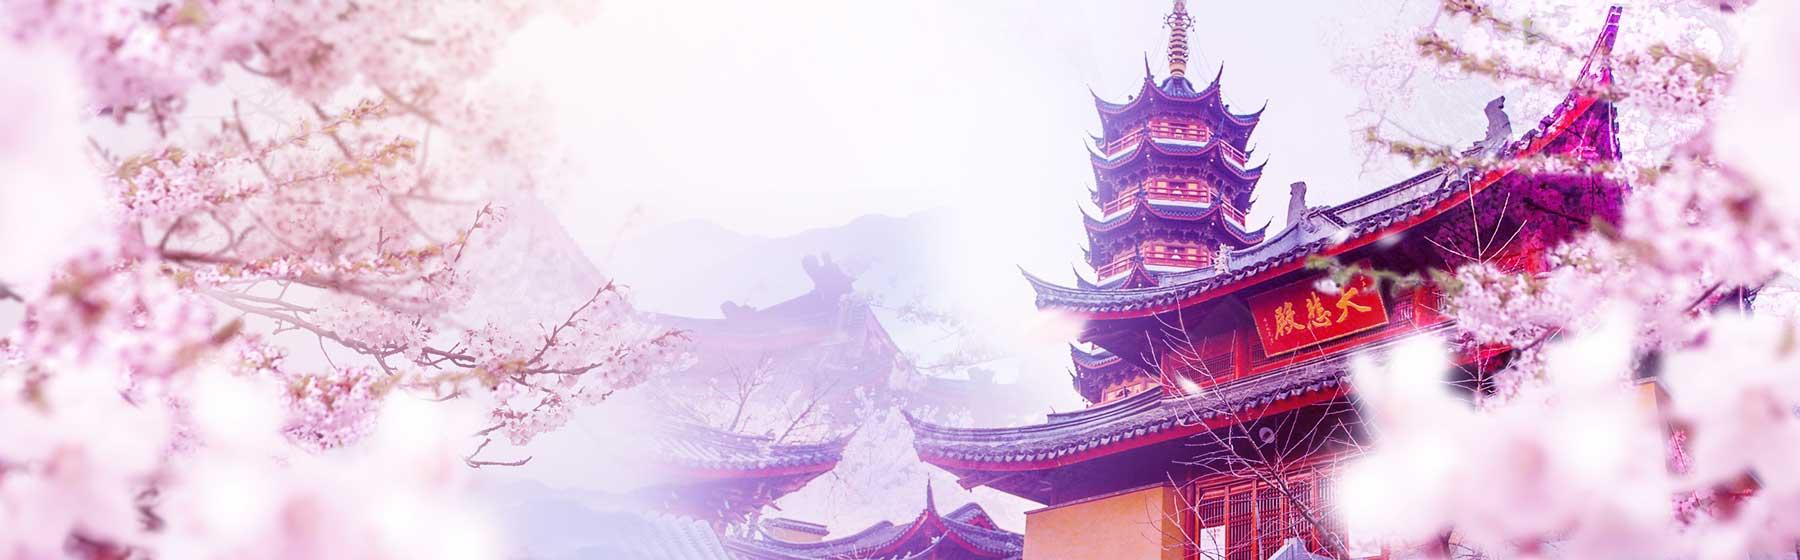 https://ru.gonanjingchina.com/sites/default/files/have-a-date-with-spring-in-nanjing-2.jpg